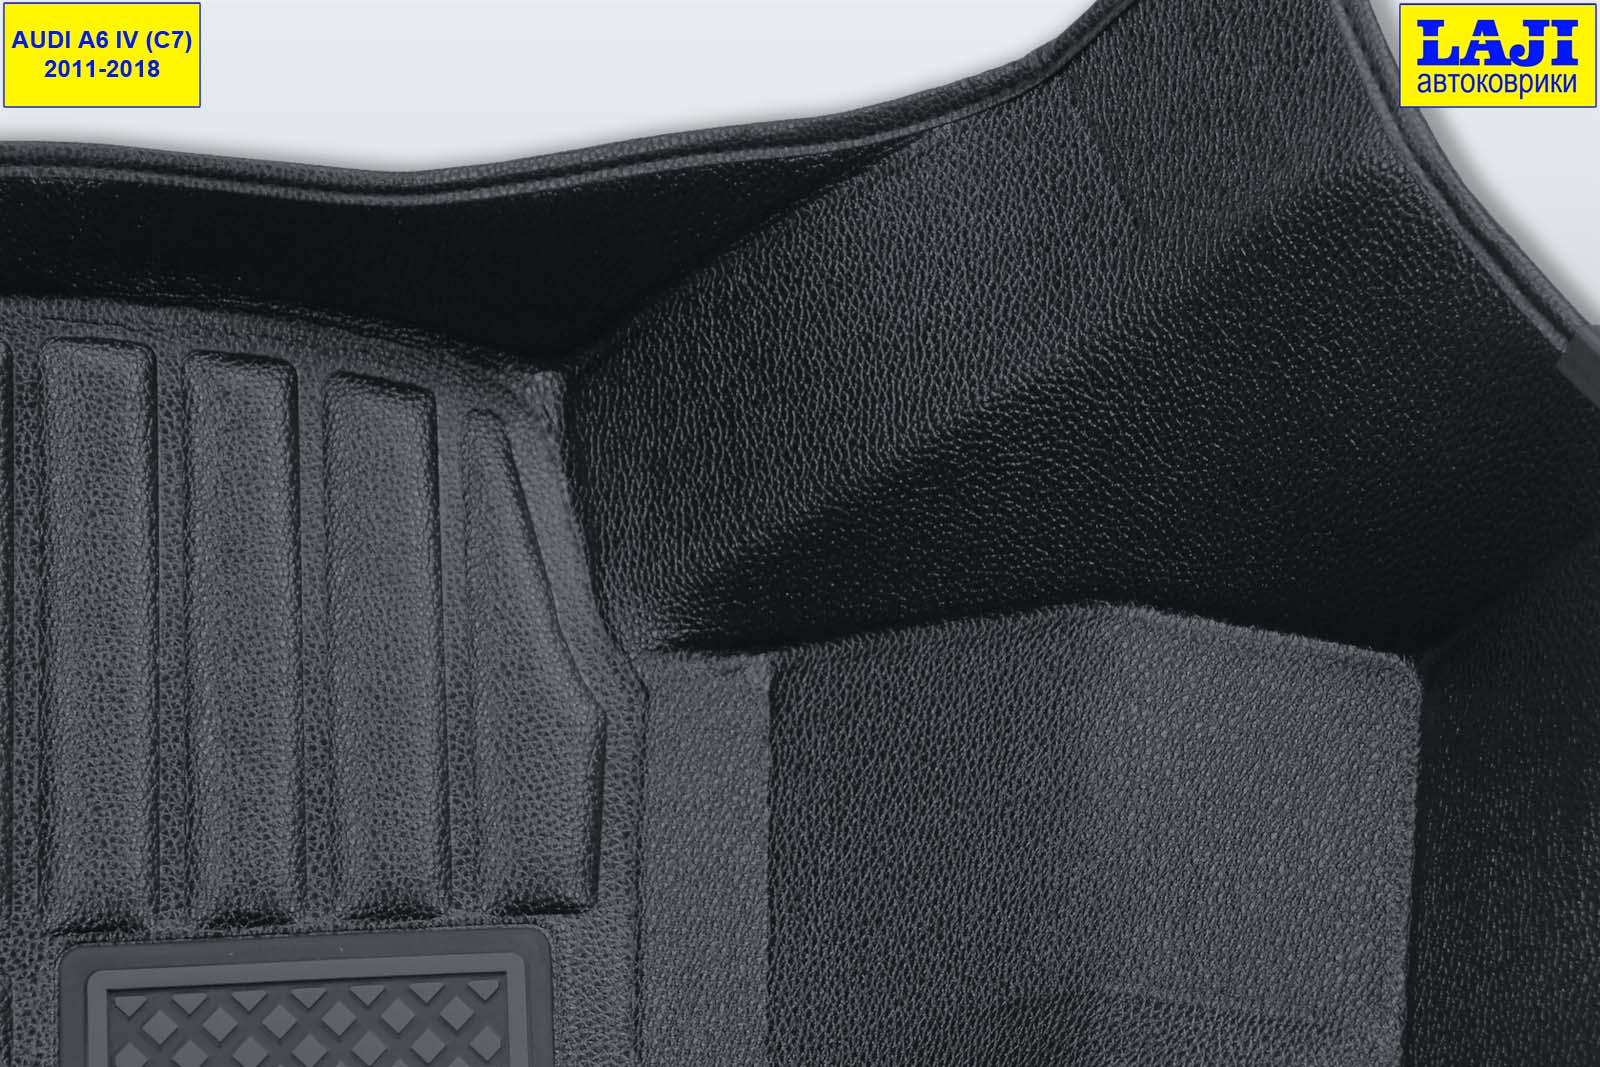 5D коврики для Audi A6 C7 2011-2018 6